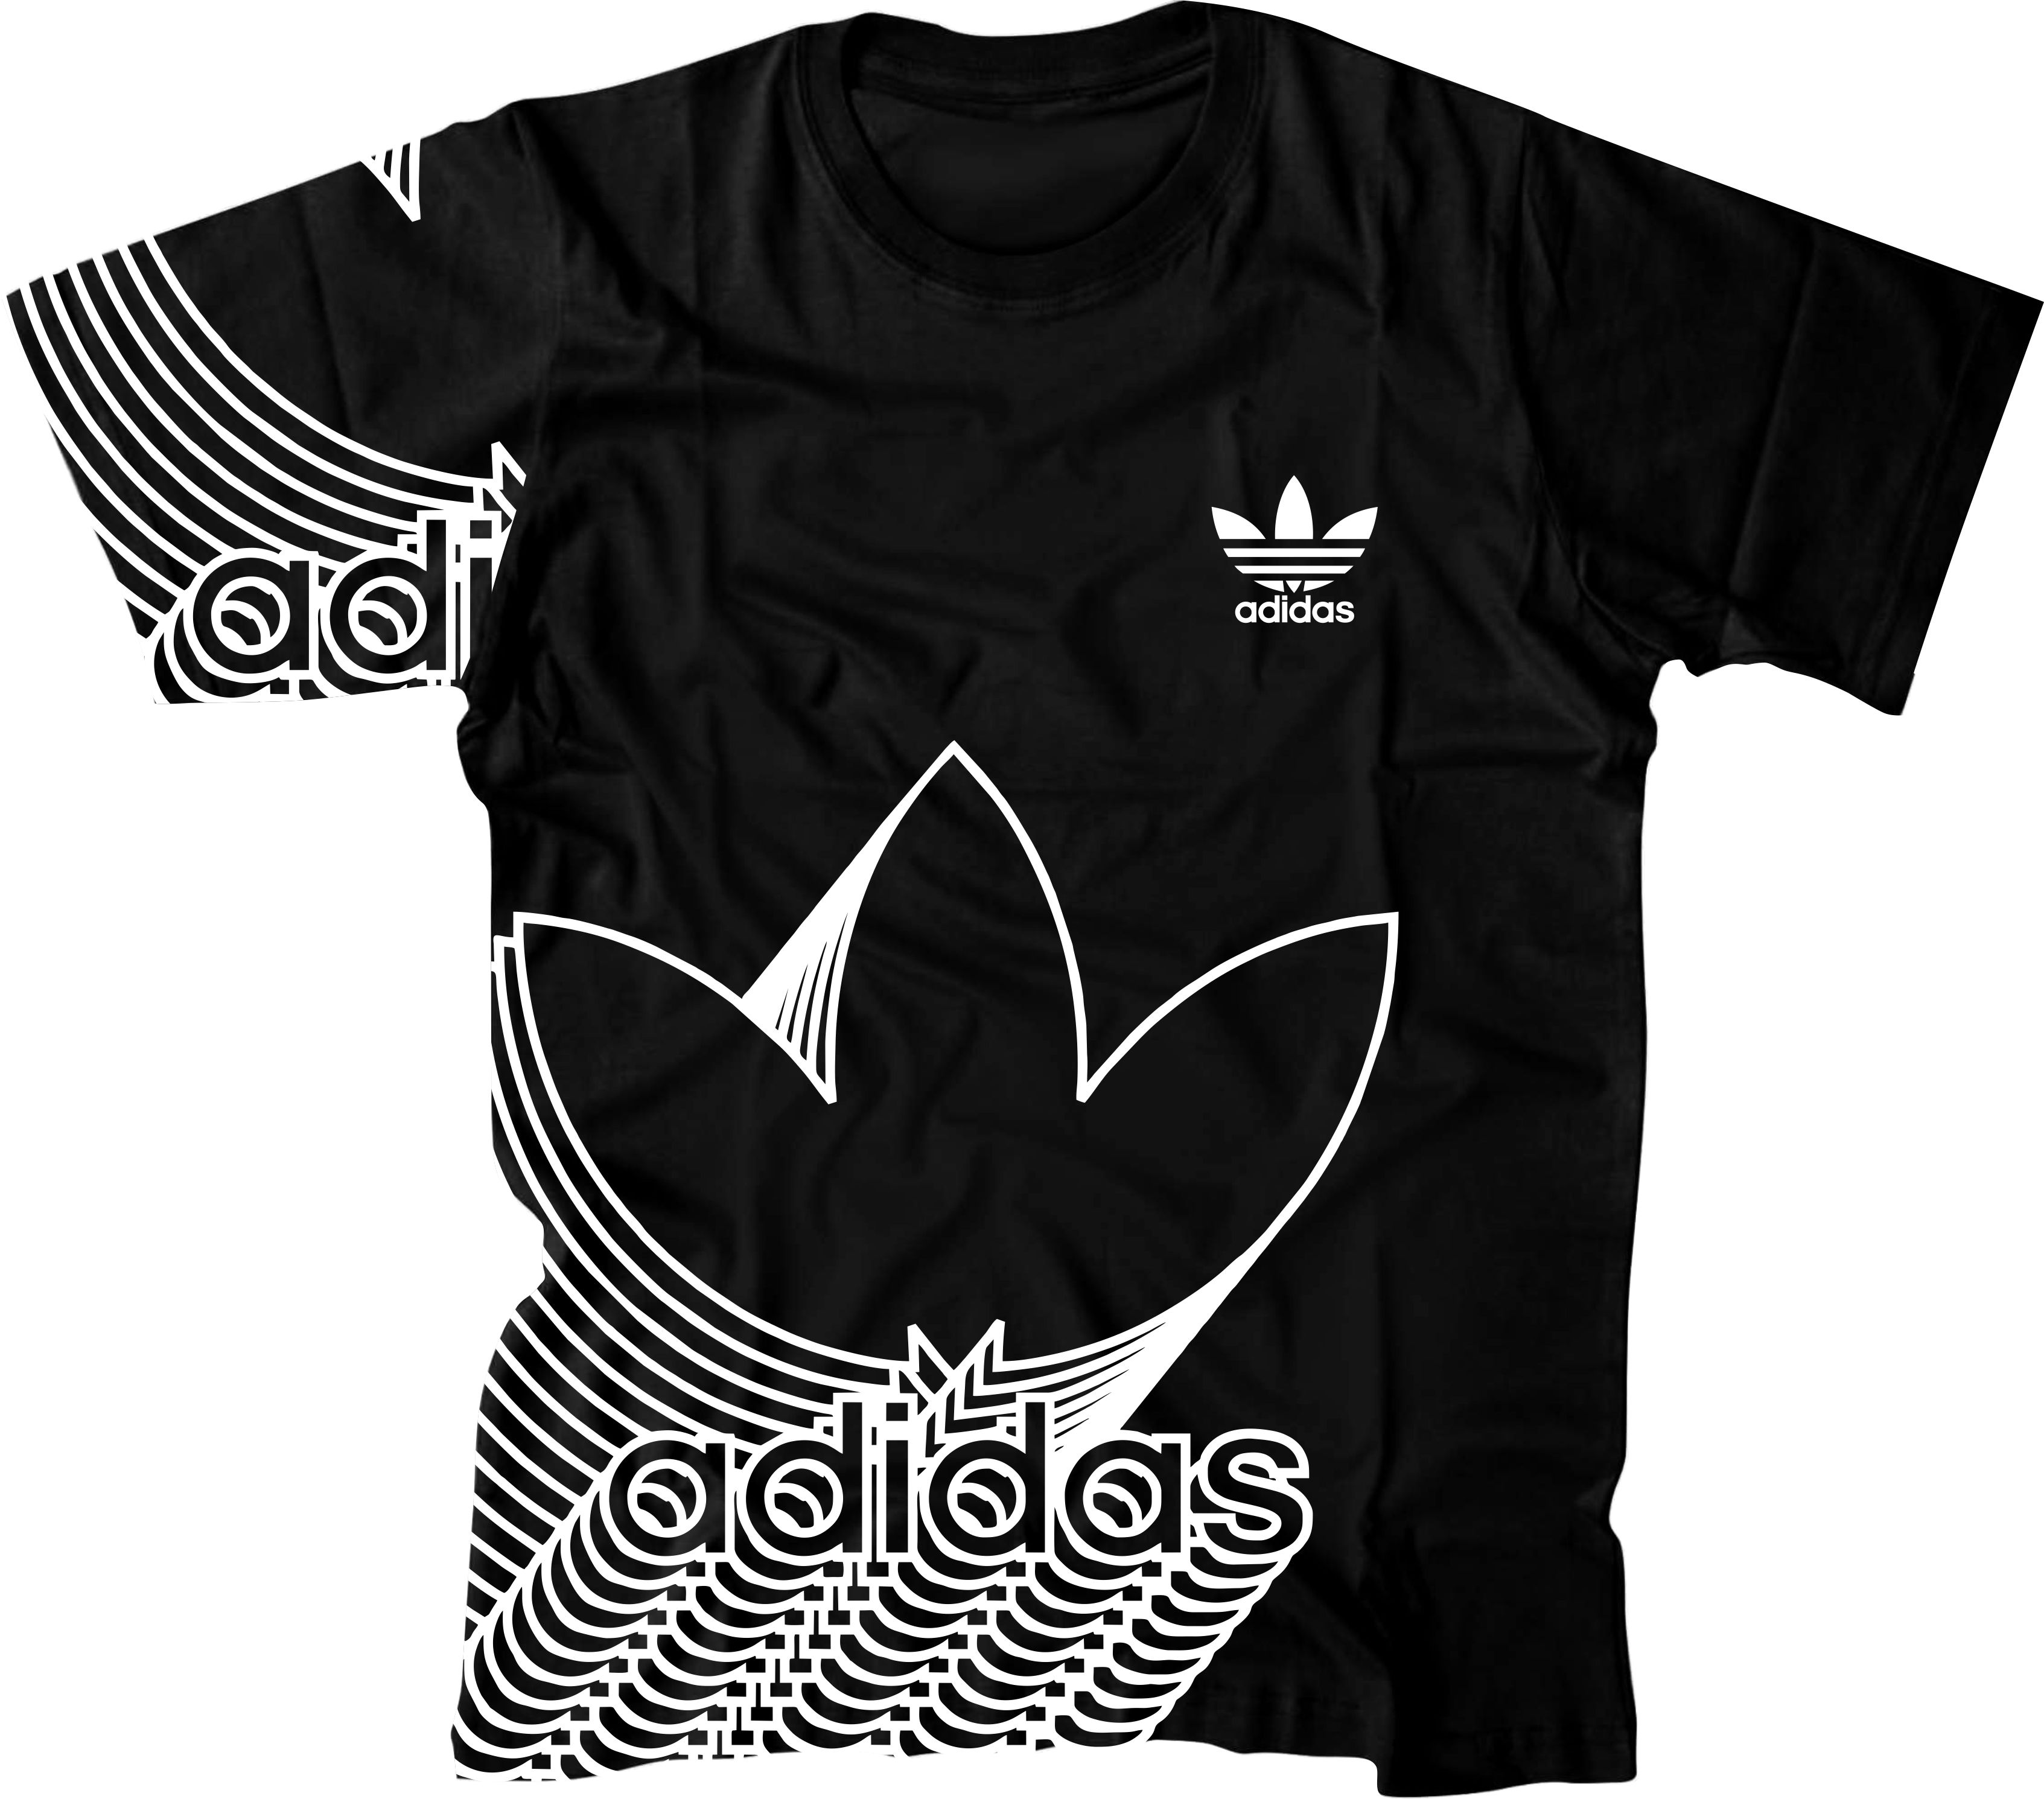 adidas t shirt 2018 Off 50% platrerie